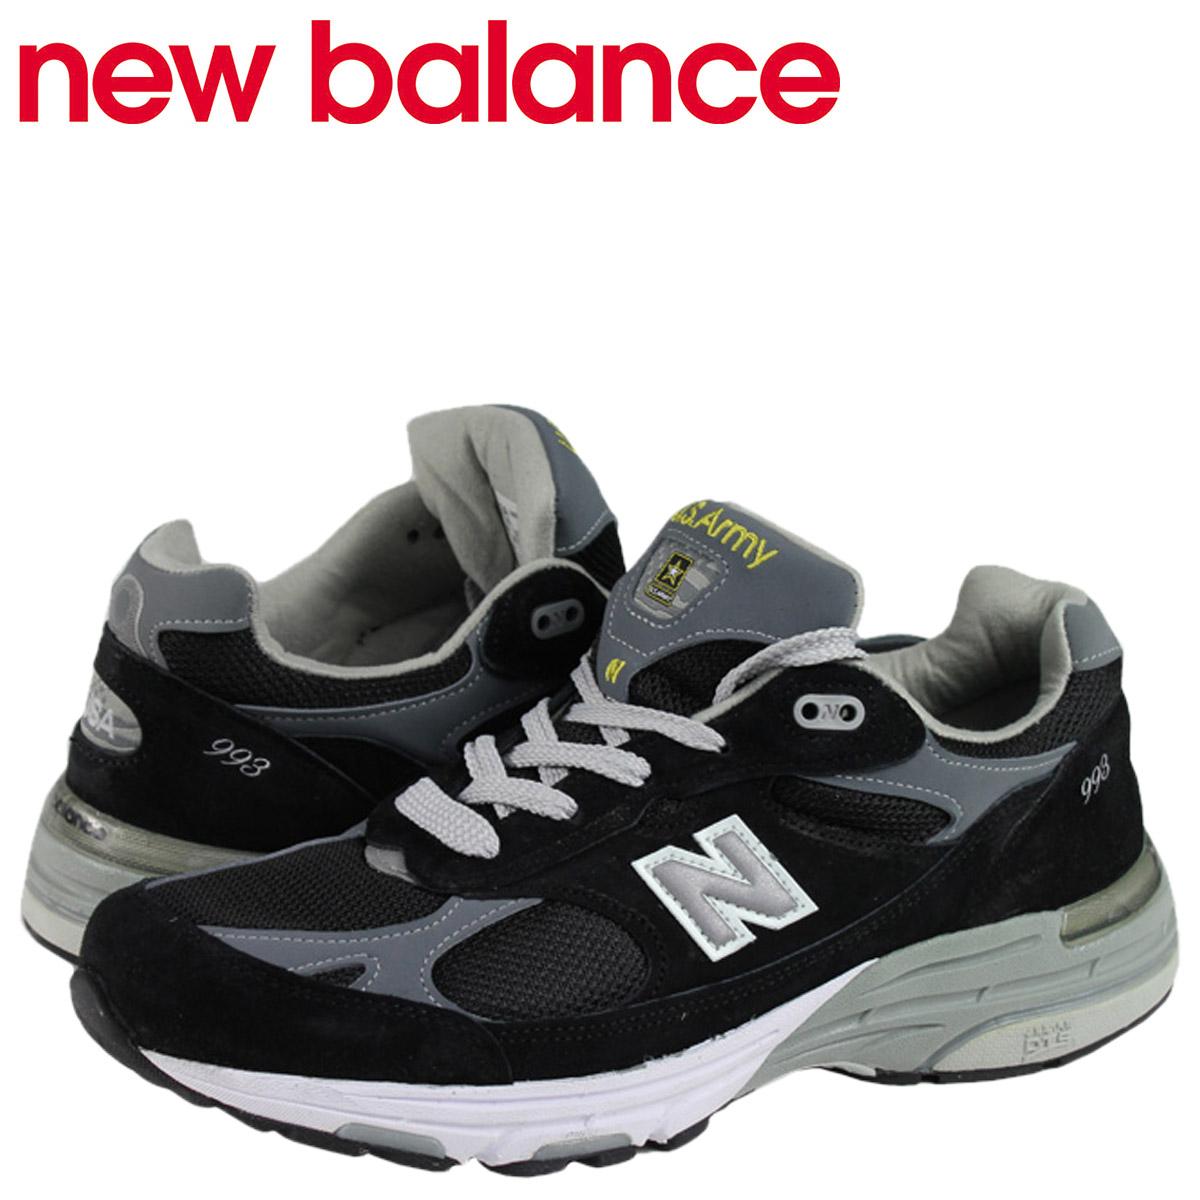 new balance 993 us army